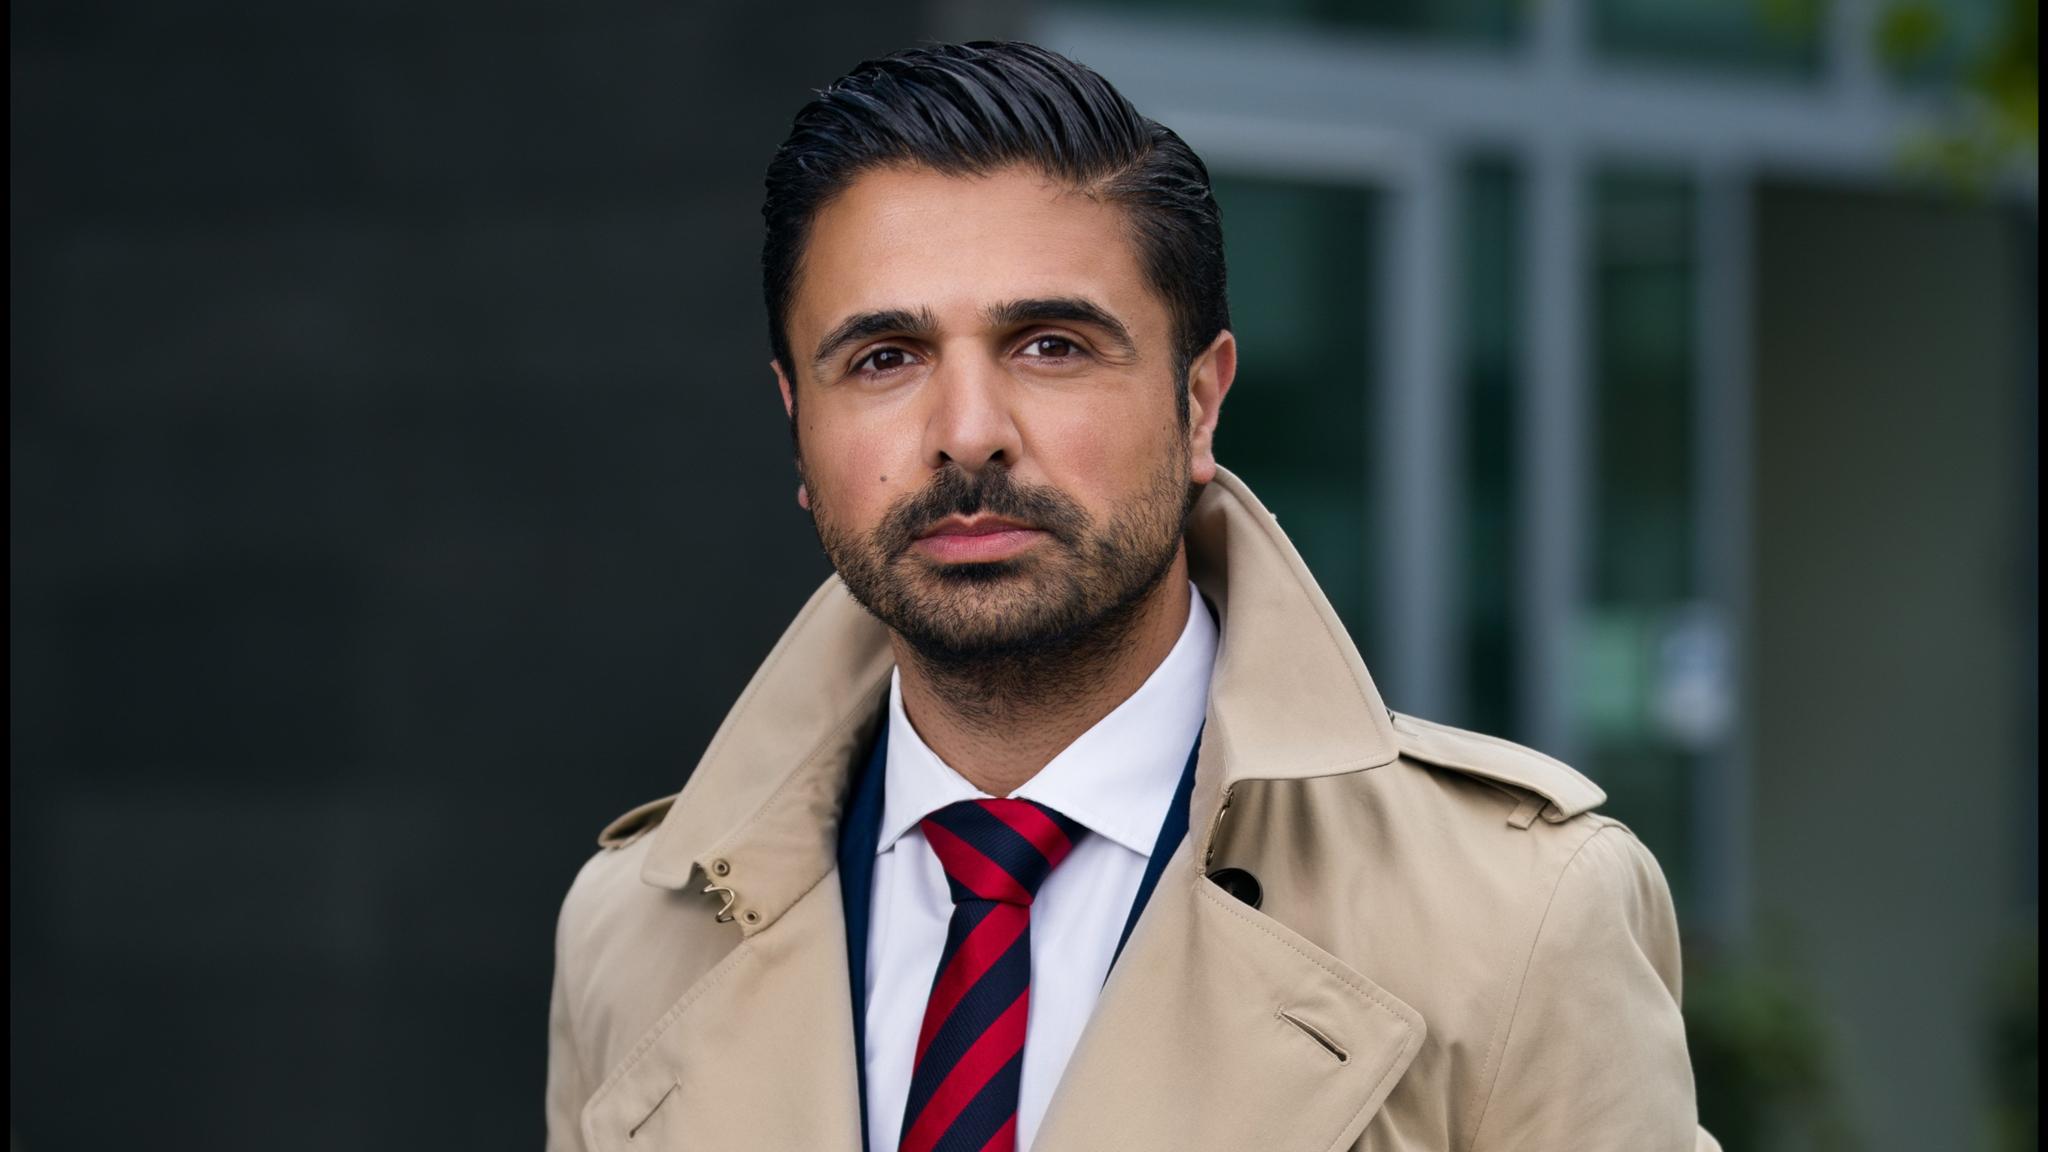 Arash Raoufi